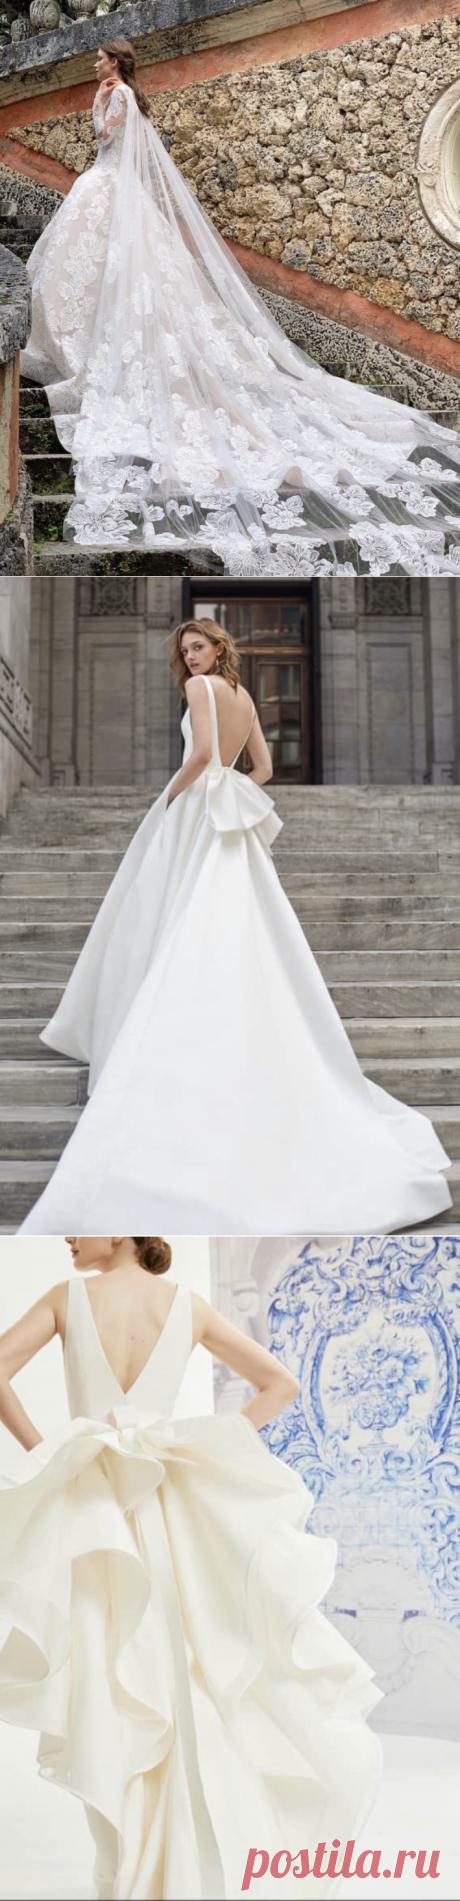 7 Beautiful Wedding Dress Trends